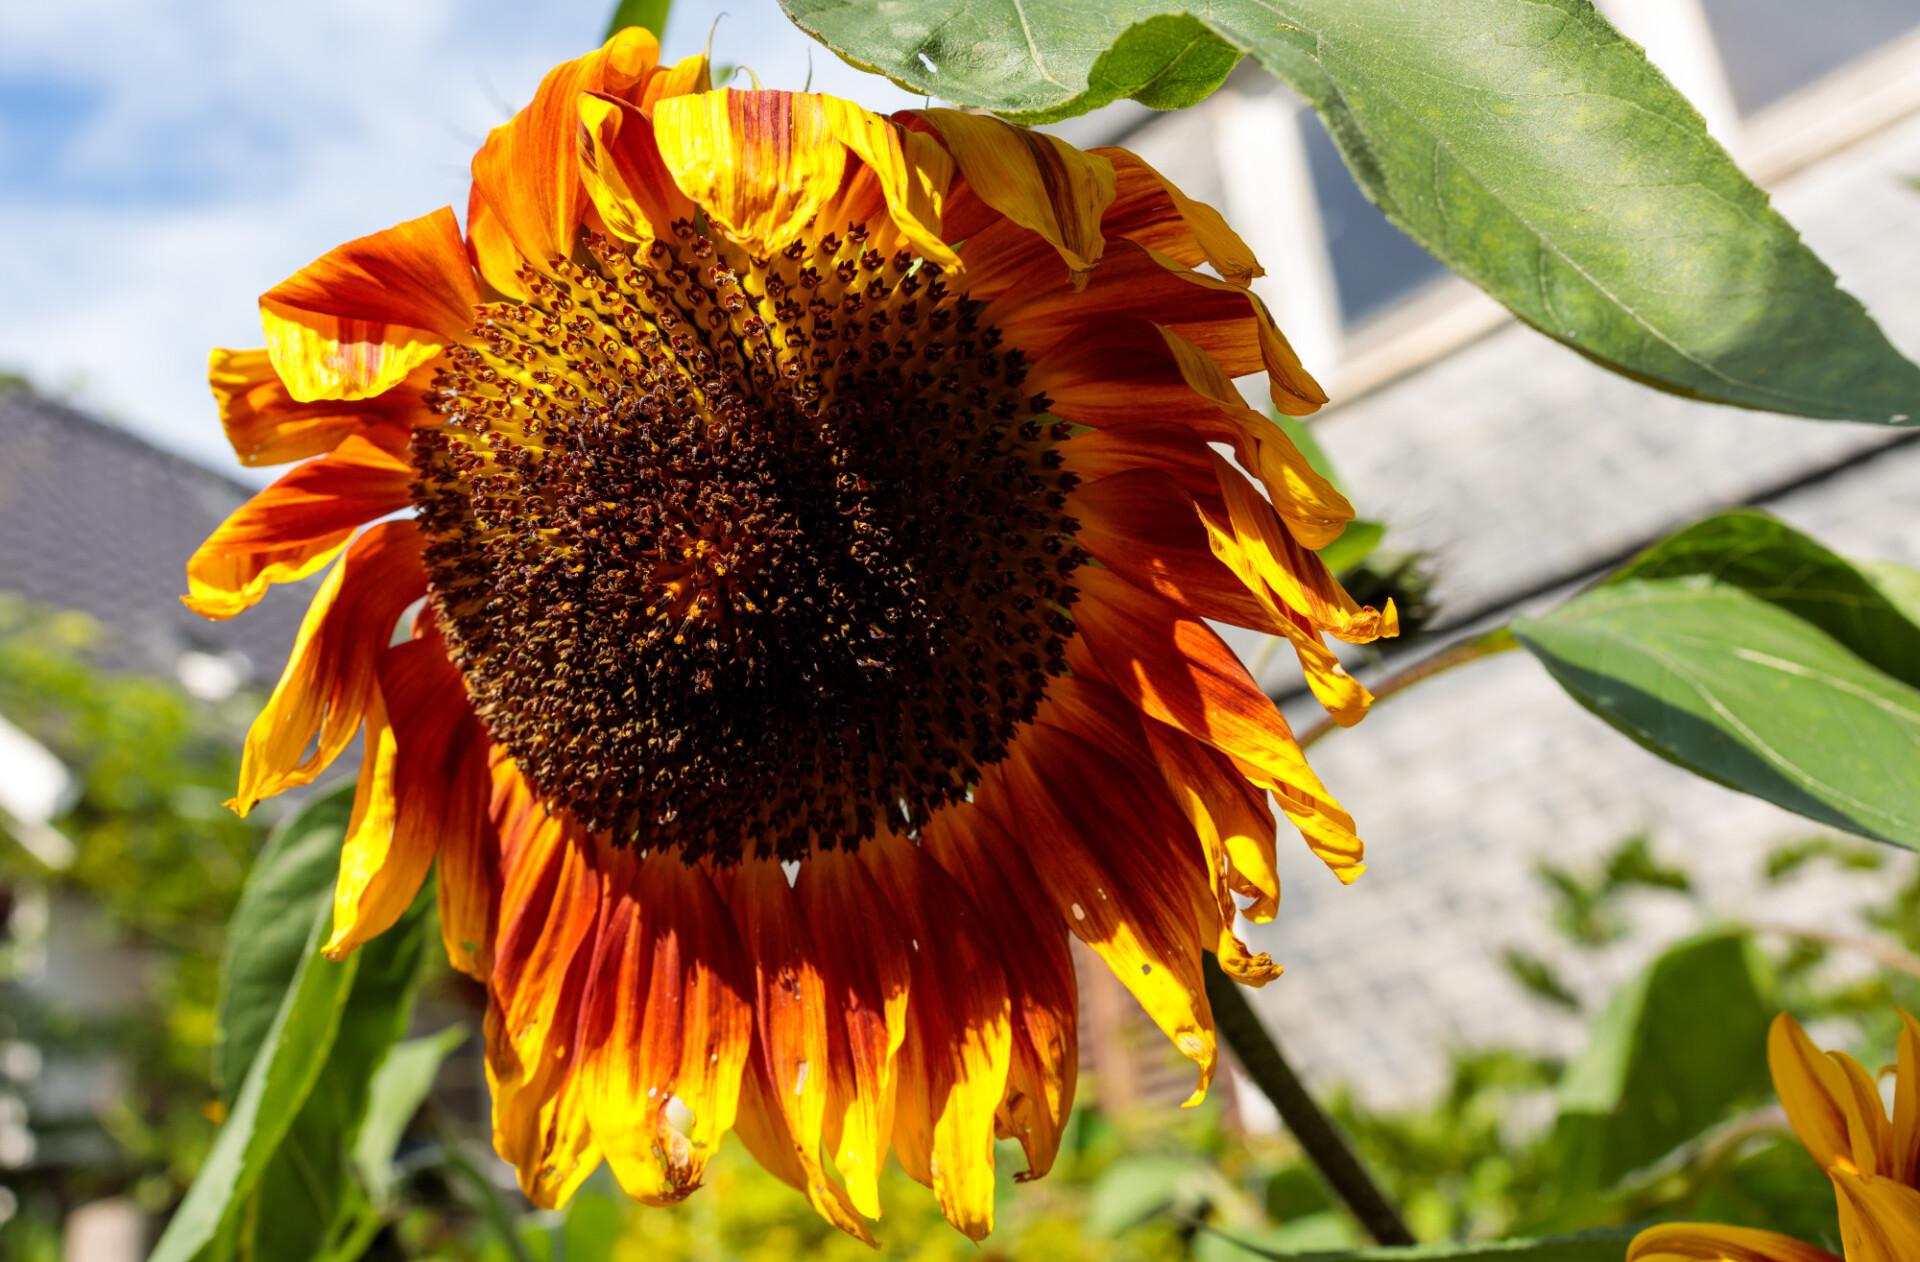 Yellow red sunflower in the garden